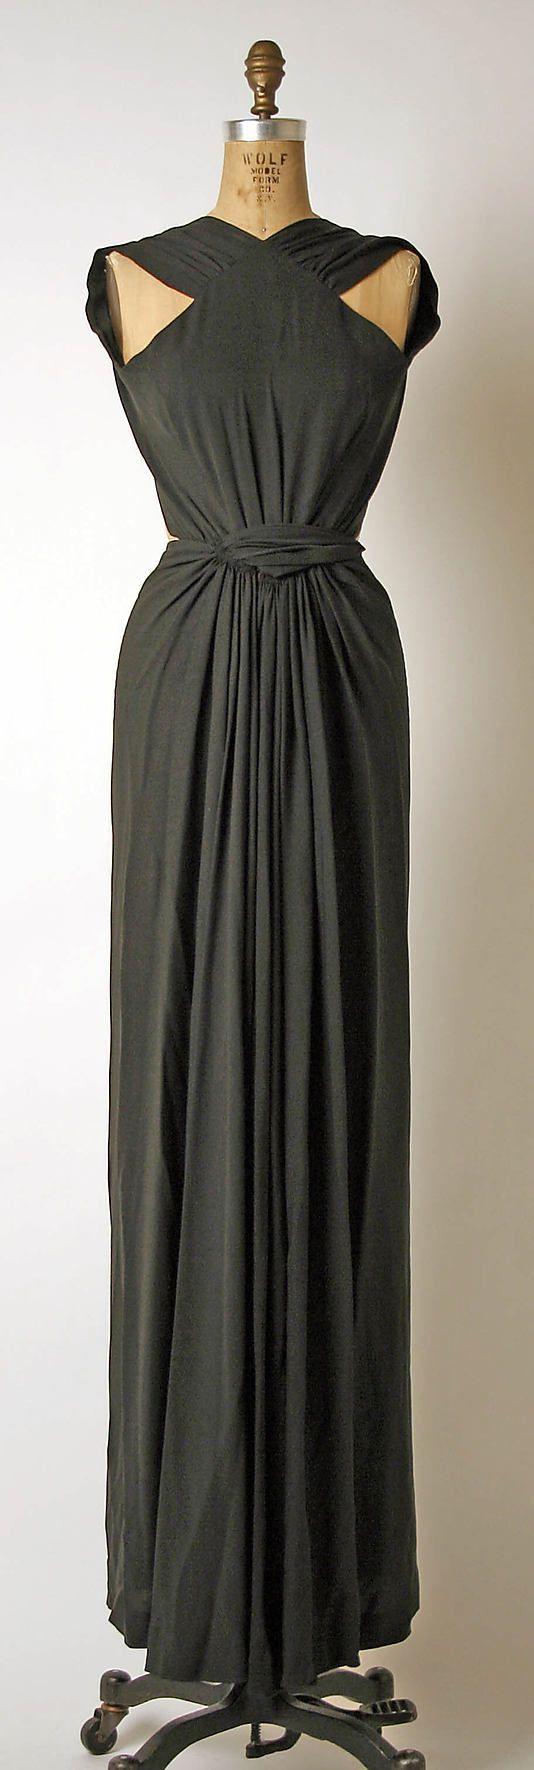 madame gres dress - Google Search